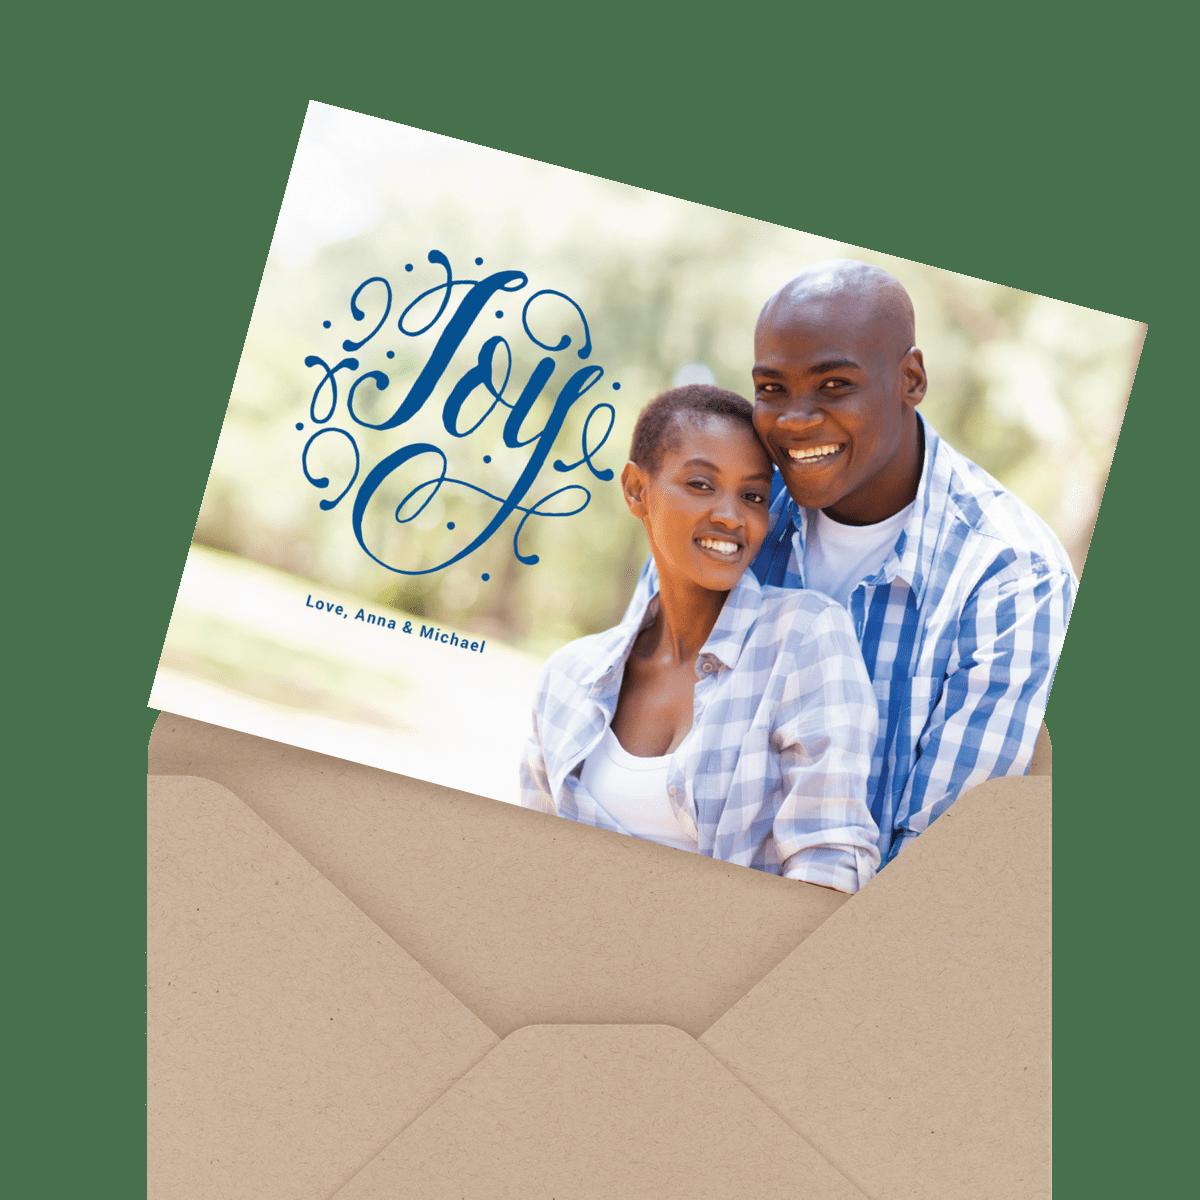 red joy peace love holiday card